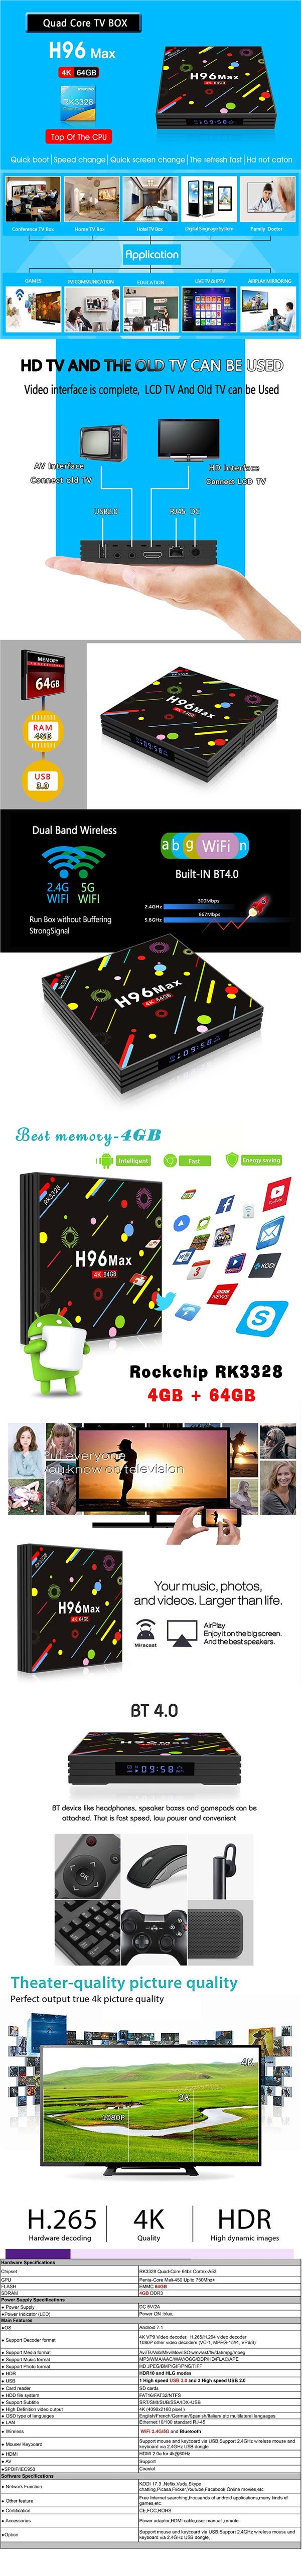 H96 MAX H2 4G+64G Rockchip RK3328 Android TV Box /Bluetooth /4K/ IPTV